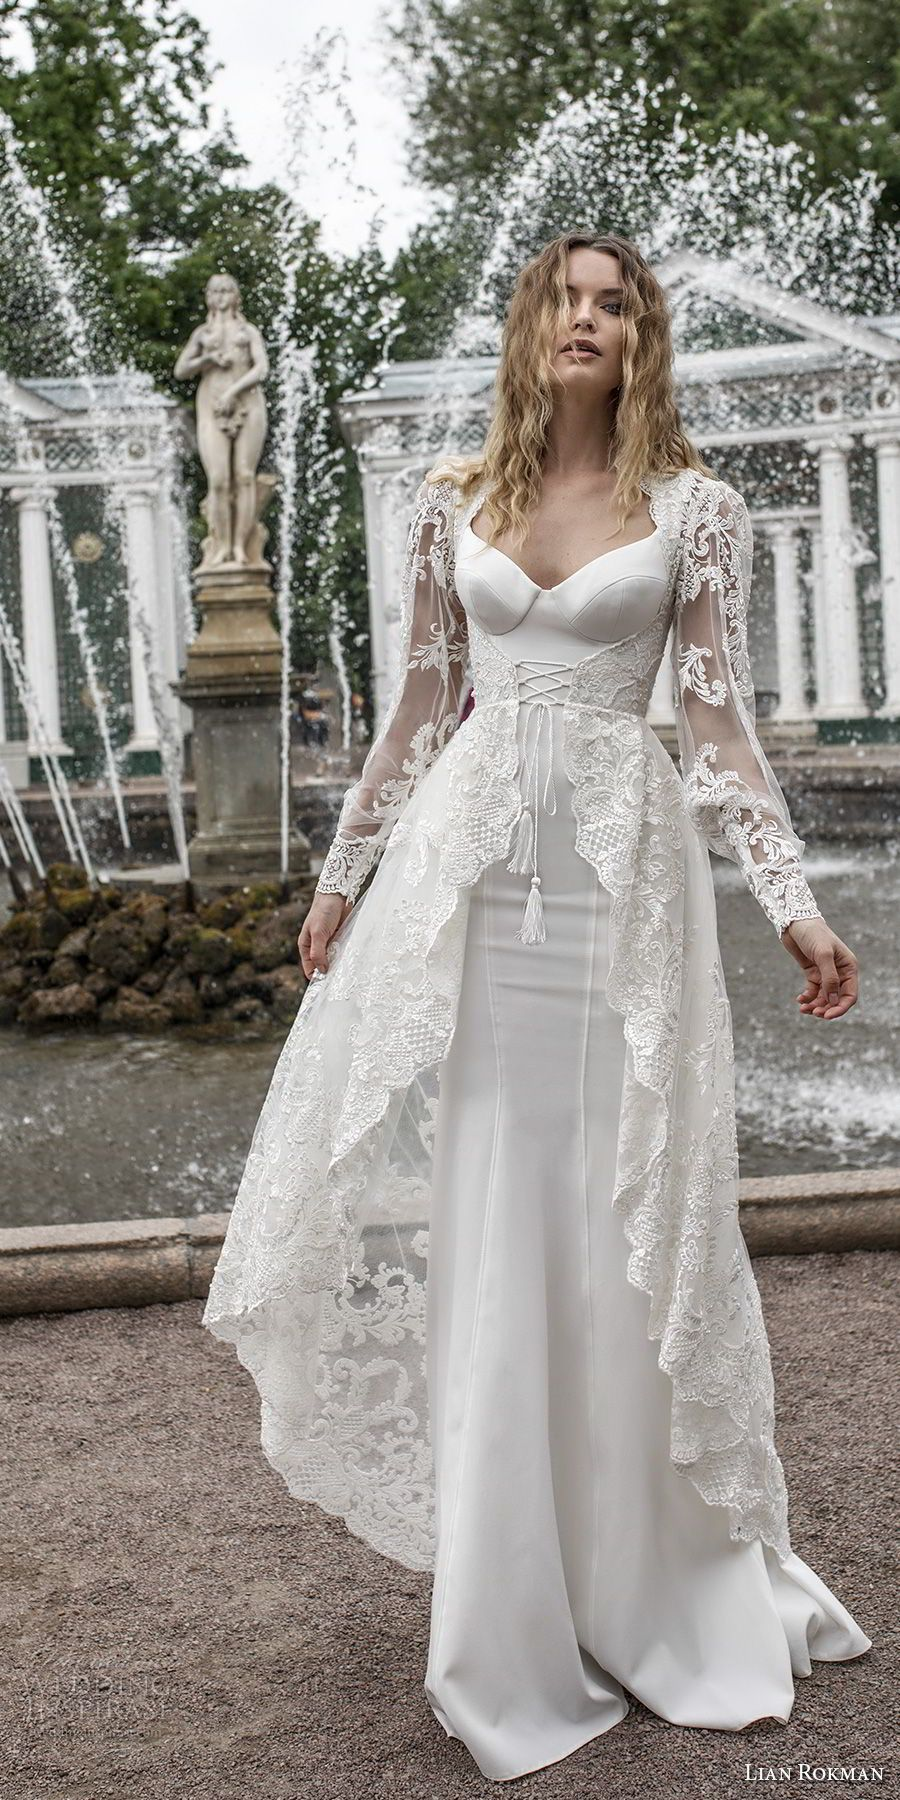 Lian rokman bridal long sleeves ballerina neckline simple full